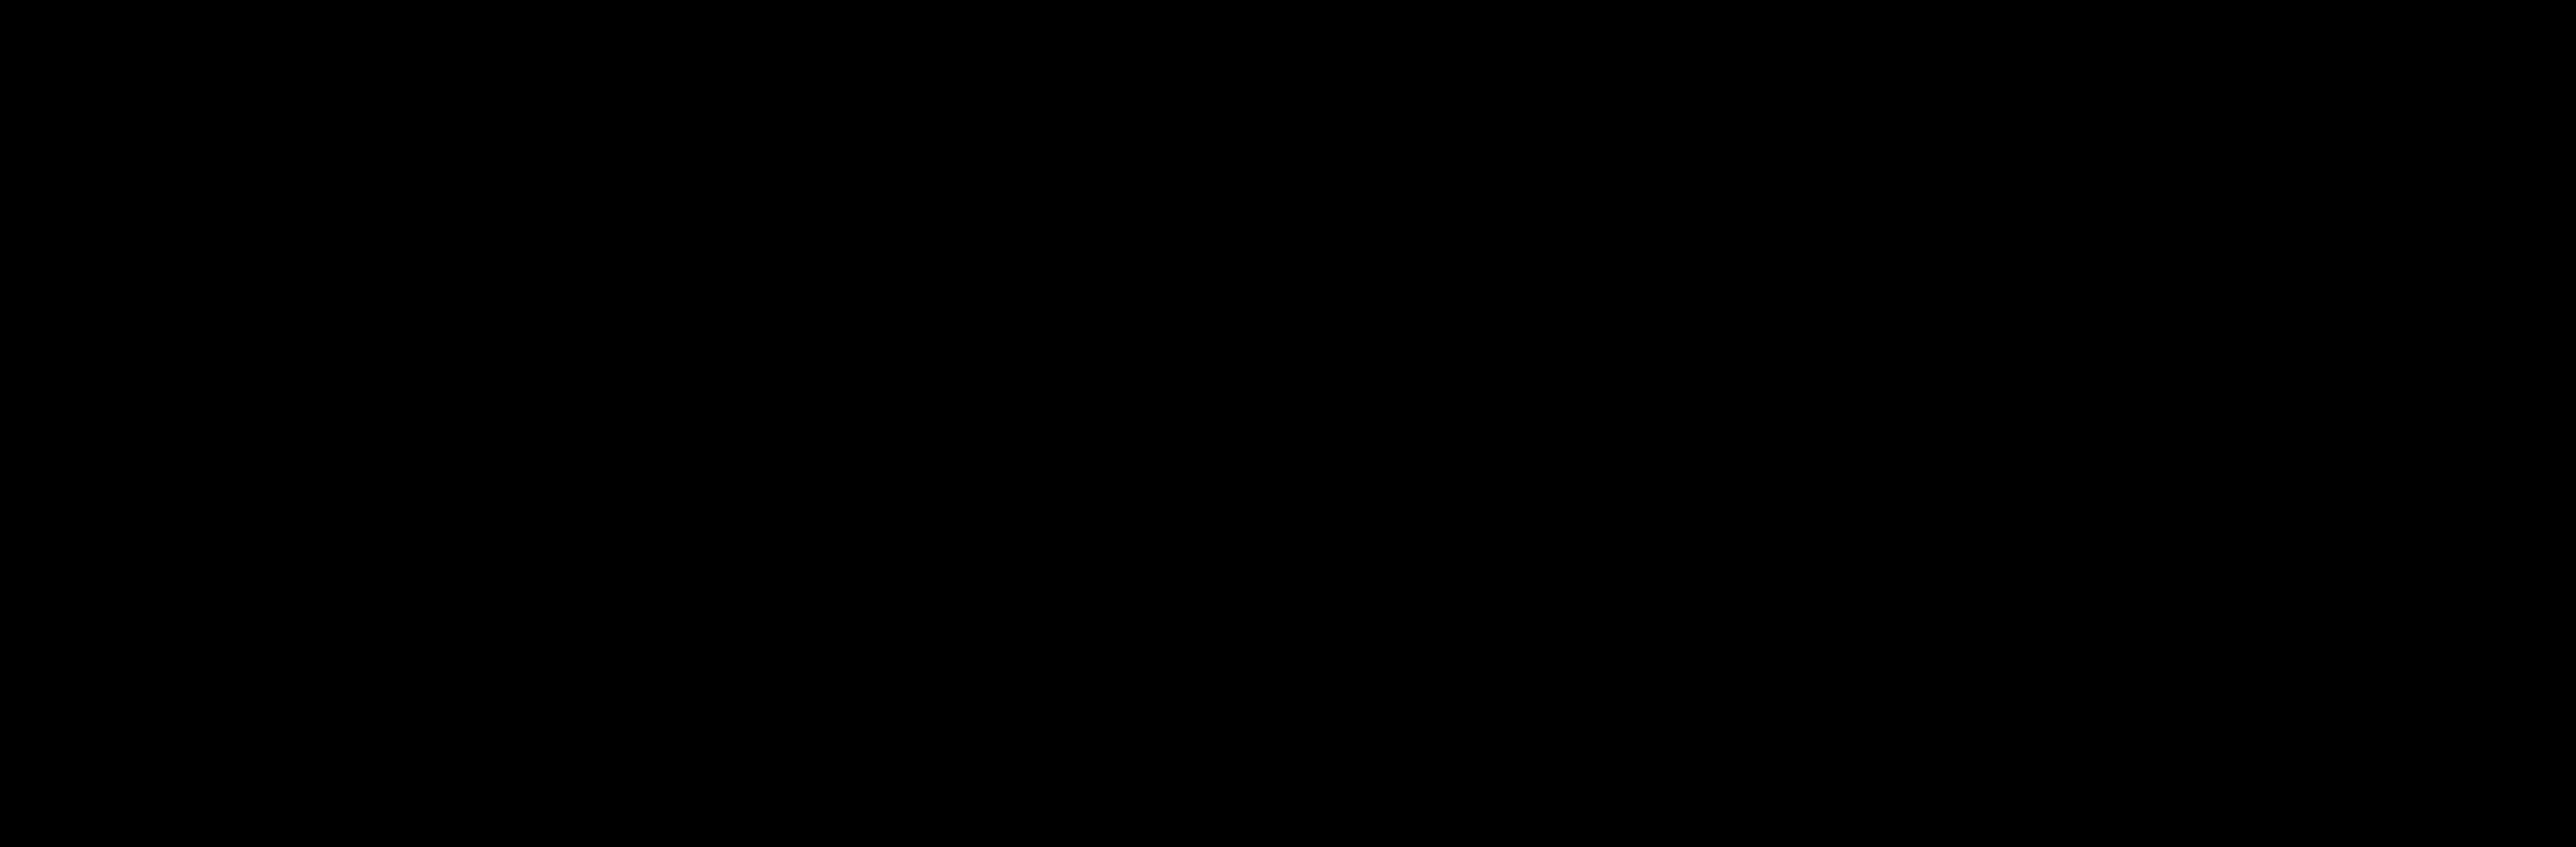 oneill logo - O'Neill Logo